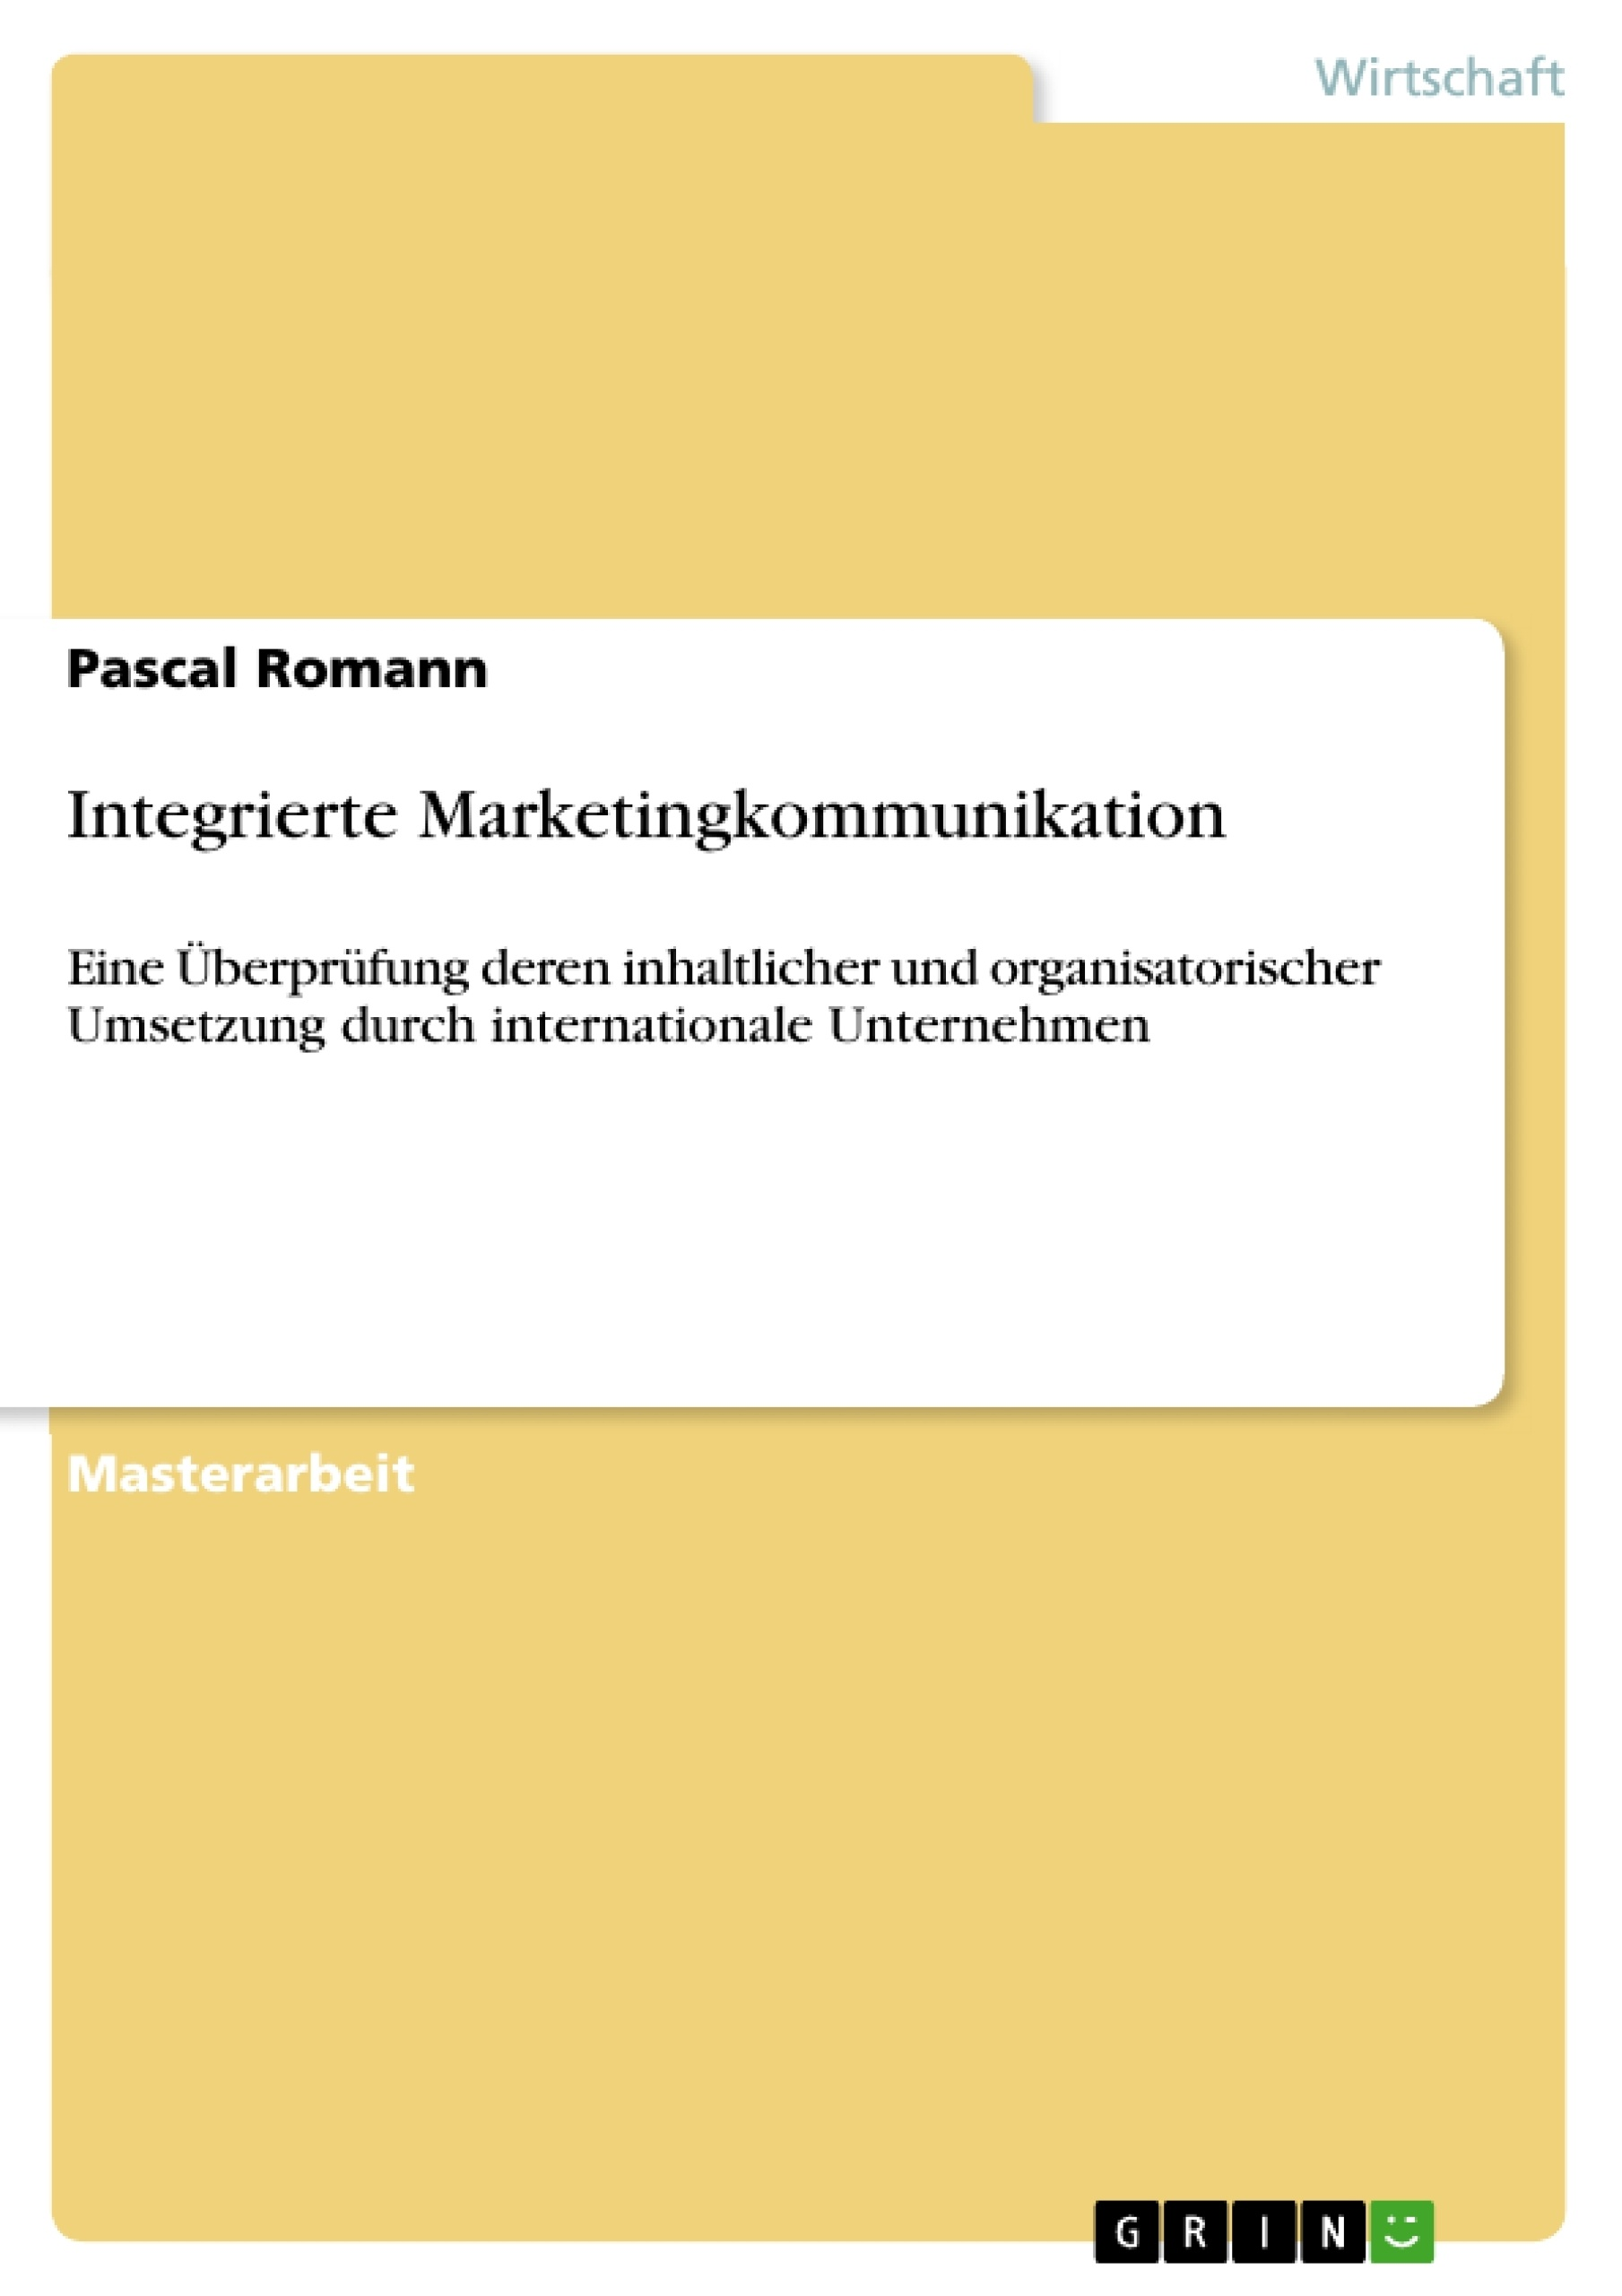 Titel: Integrierte Marketingkommunikation